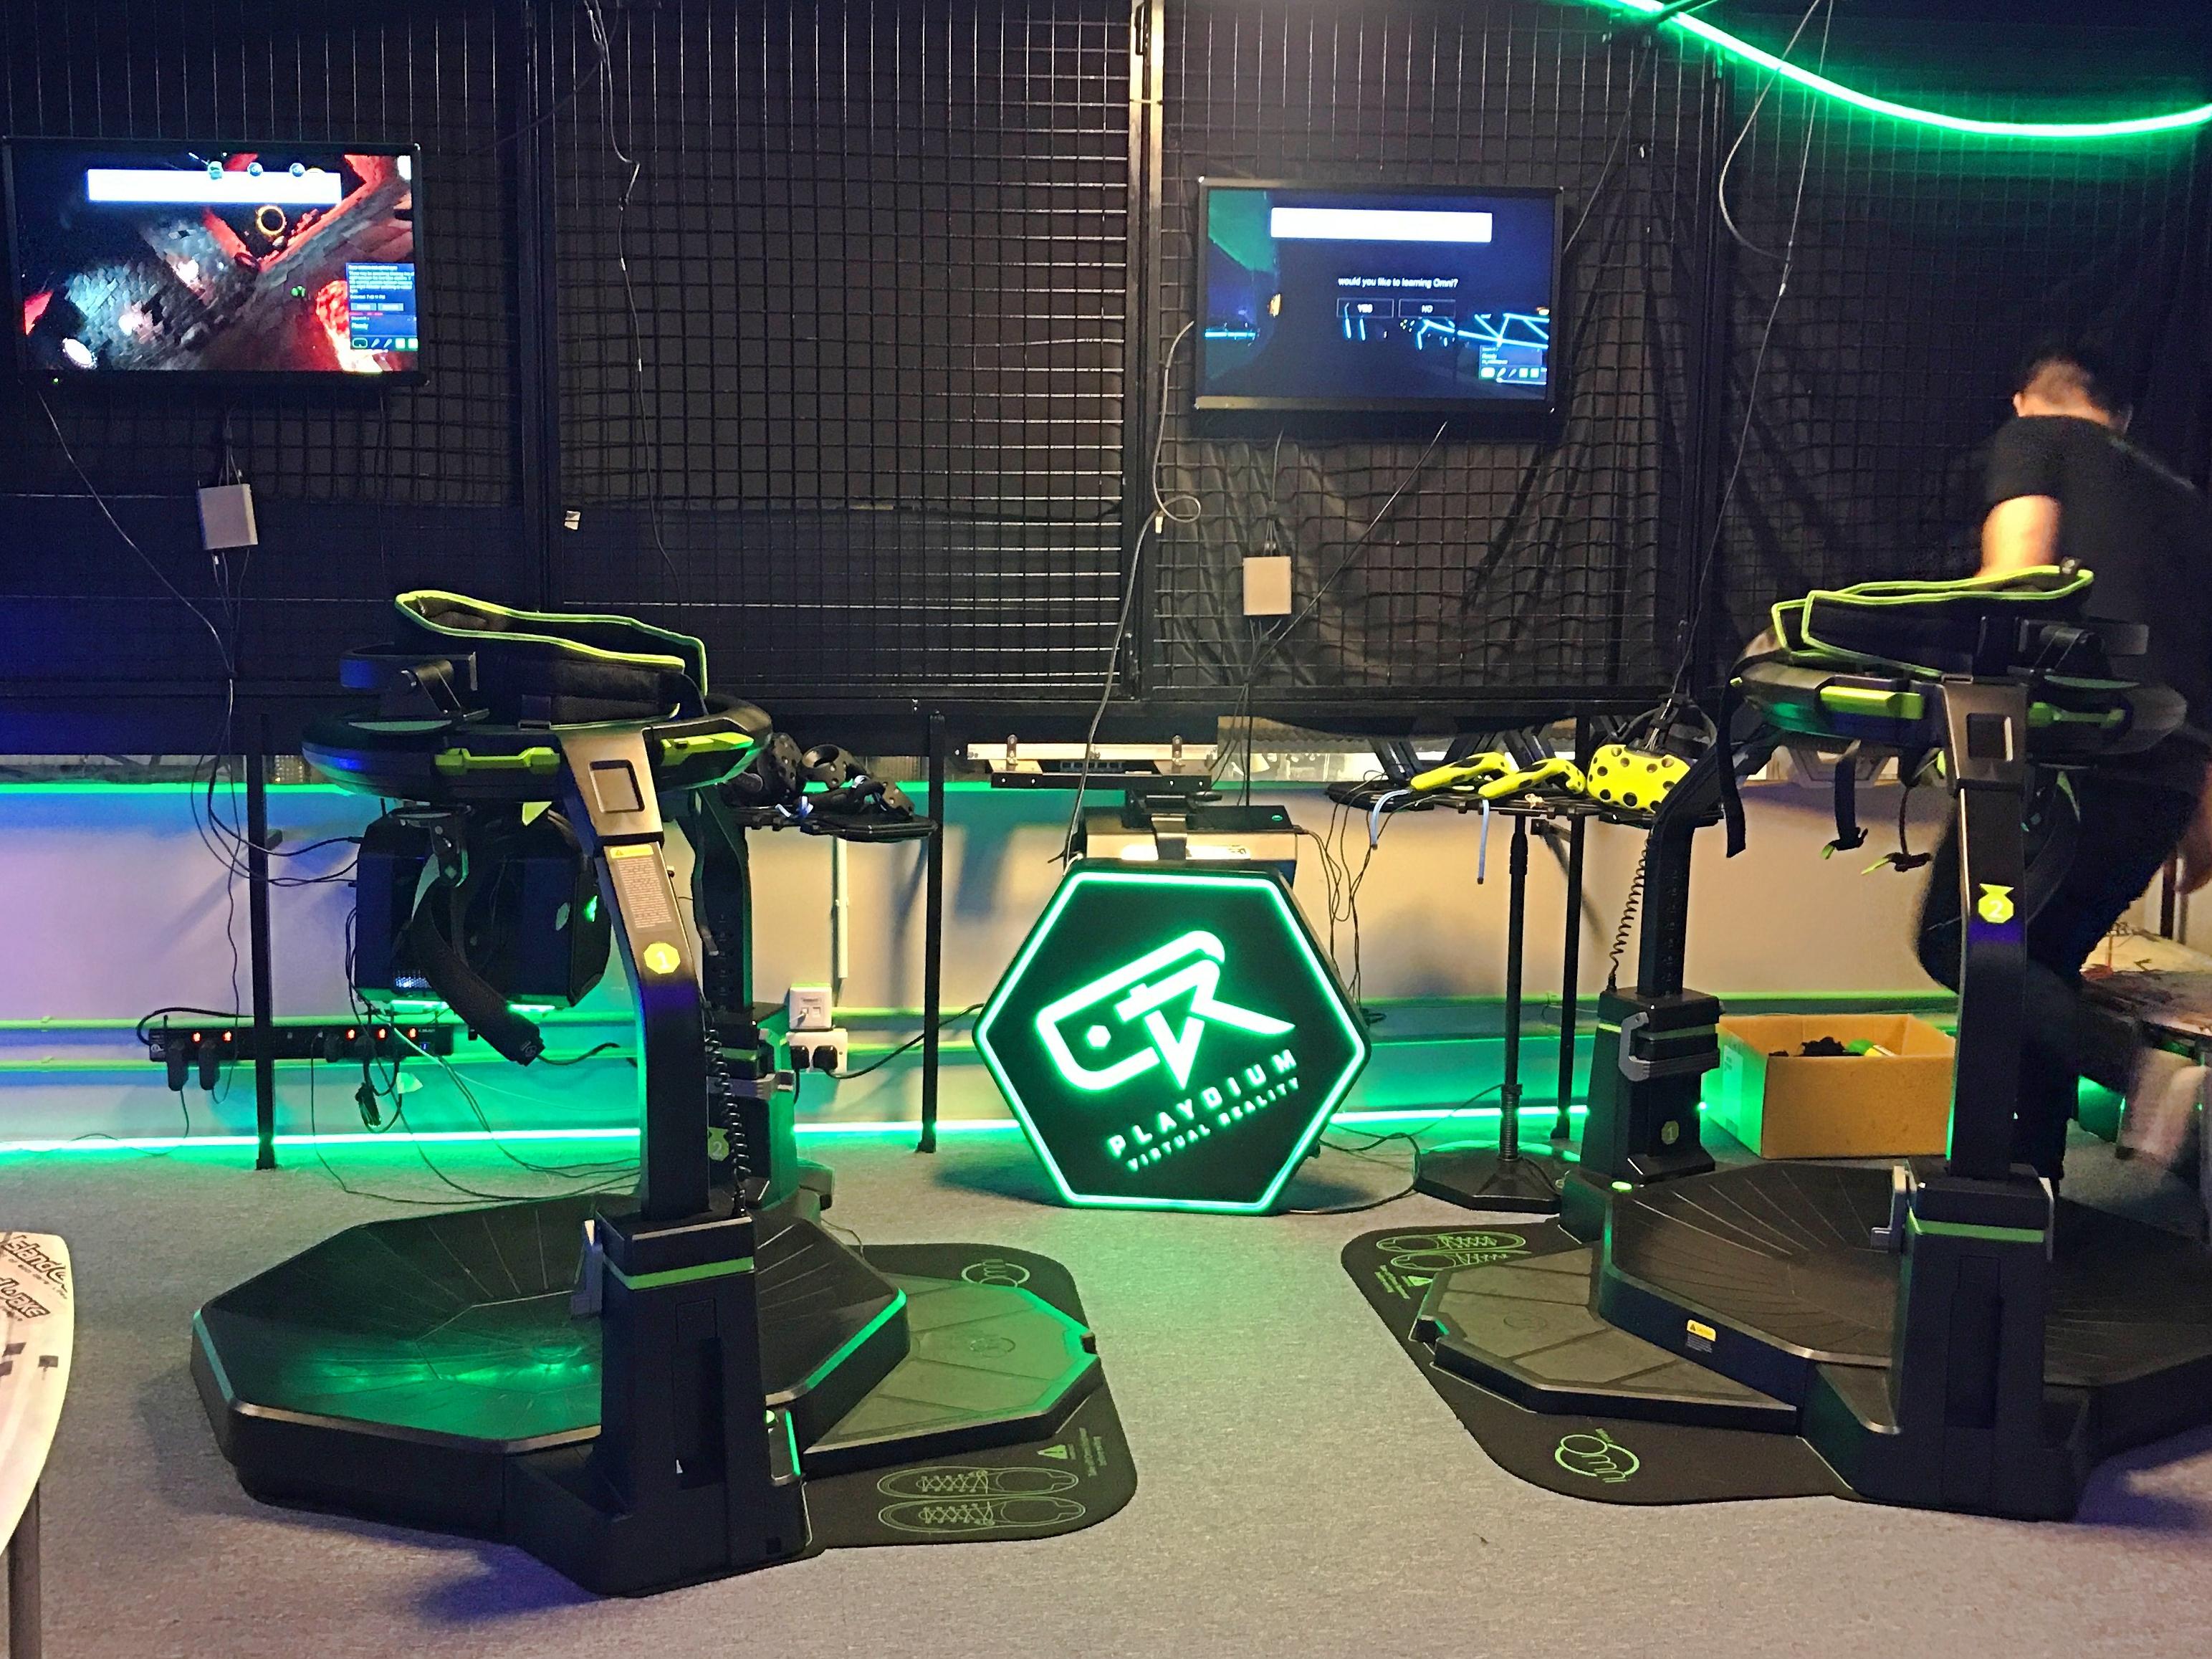 We went gaming at a VR arcade in Hong Kong   TechCrunch